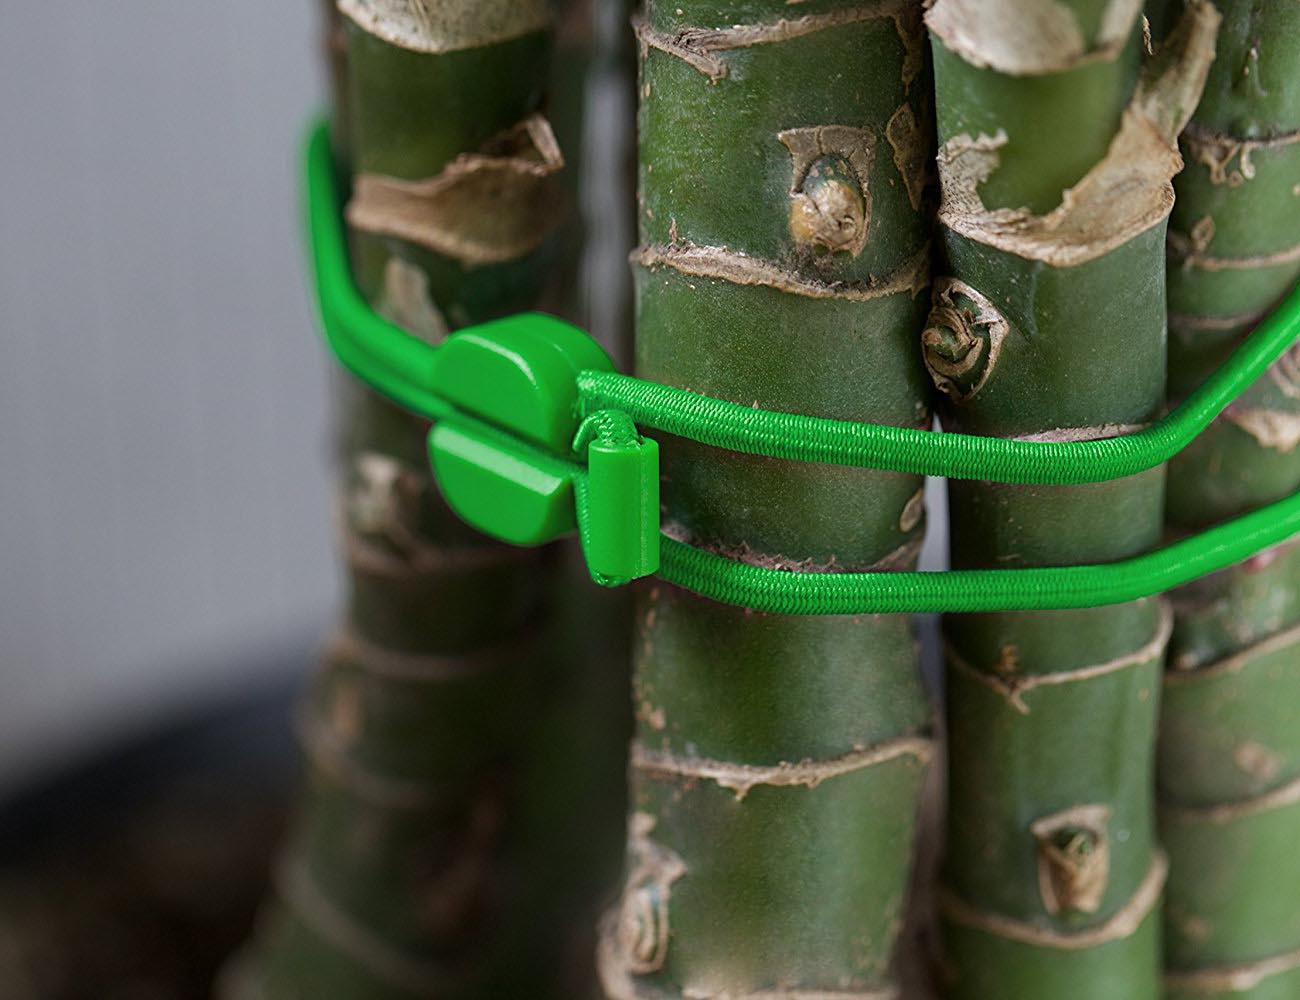 Pixi – Reusable Multi-Purpose Ties by Bluelounge